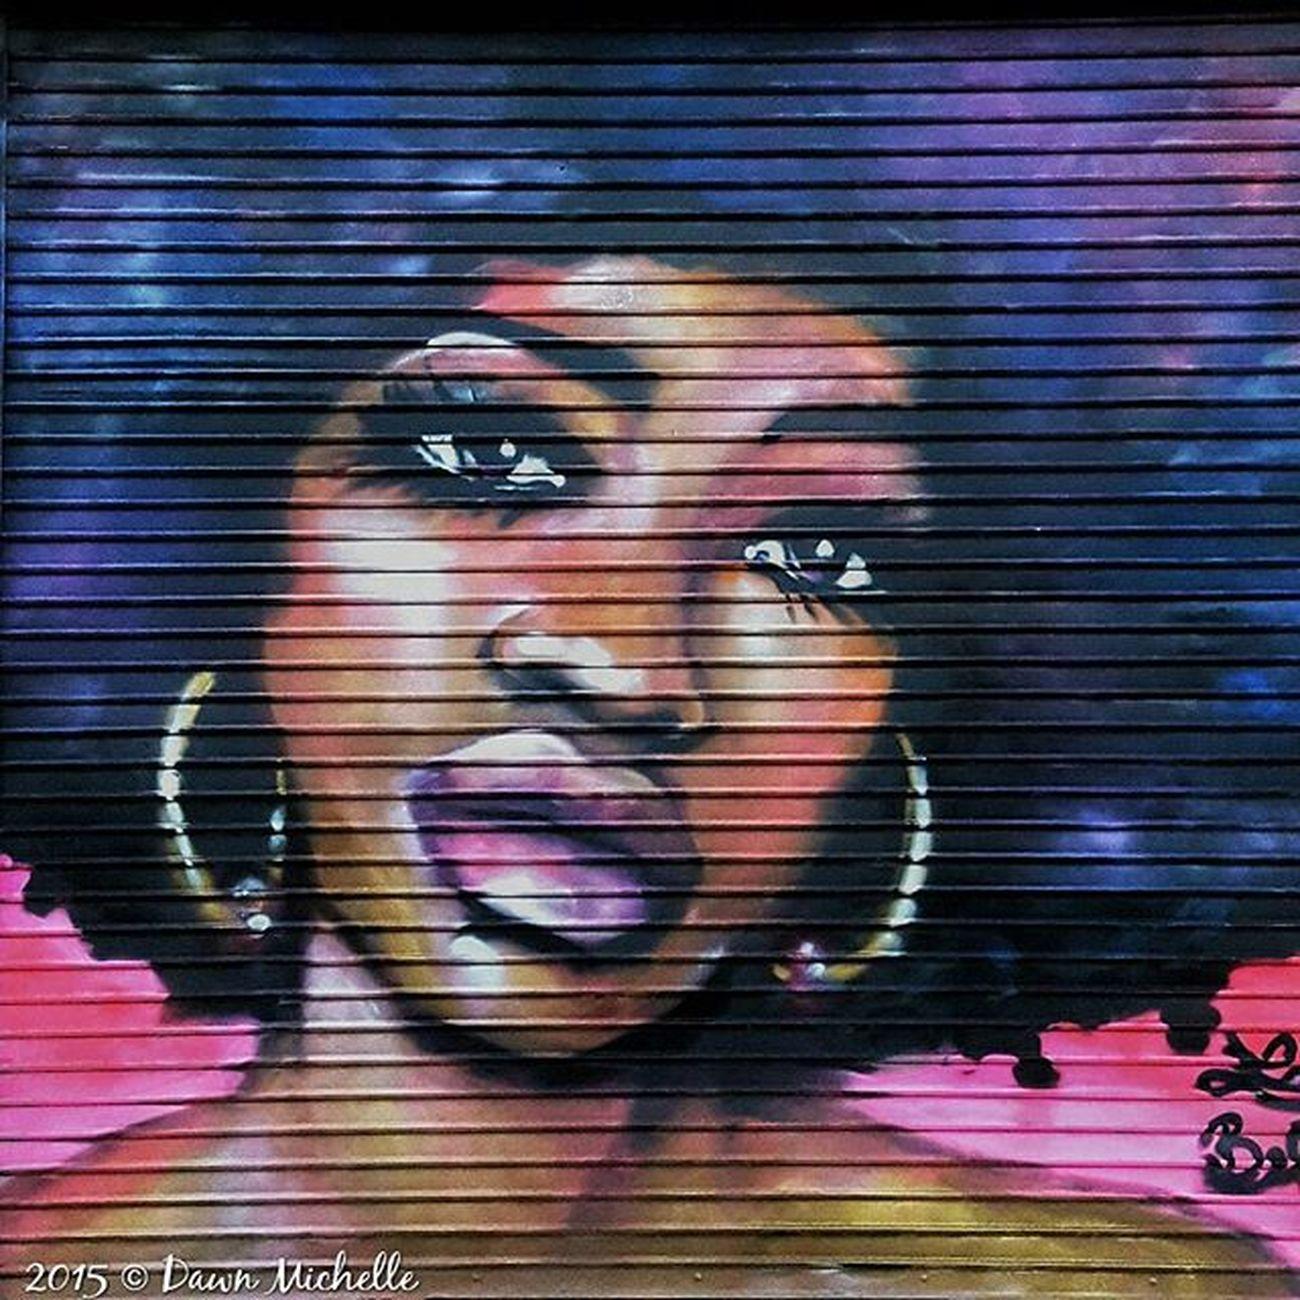 Beautiful @lexibellaart in da Bx. DopeShotBro DSB_GRAFF Rsa_graffiti Nycprime_ladies Nycprimeshot Icapturemobile Ig_captures Photooftheday Picoftheday Tag4likes Streetart Graff Graffiti Graffitiart StreetArtEverywhere Nycgraff Nycgraffiti Streetartny All_wallshots Streetart_daily Spraydaily Art ArtLife Arteurbano Splendid_urban urbanromantix feedissoclean ig_graffiti bronxbestshots welcometothebronx